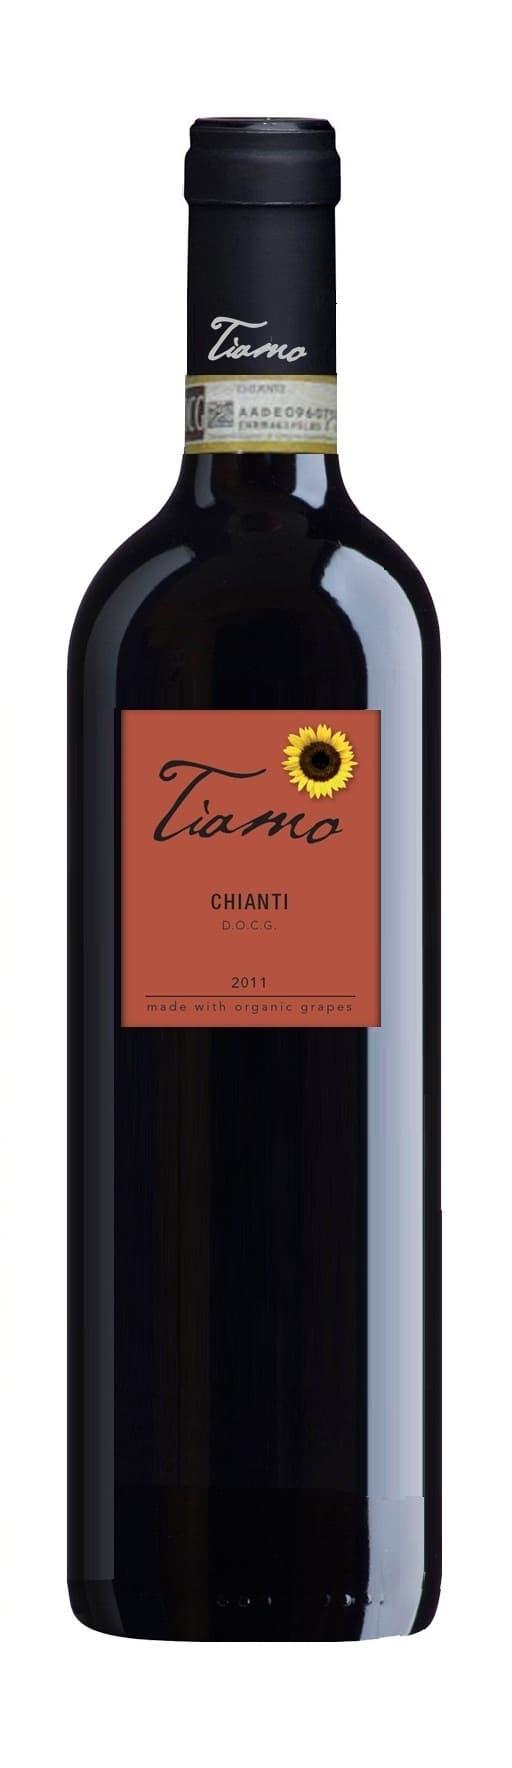 Organic Chianti DOCG – Tiamo Wines